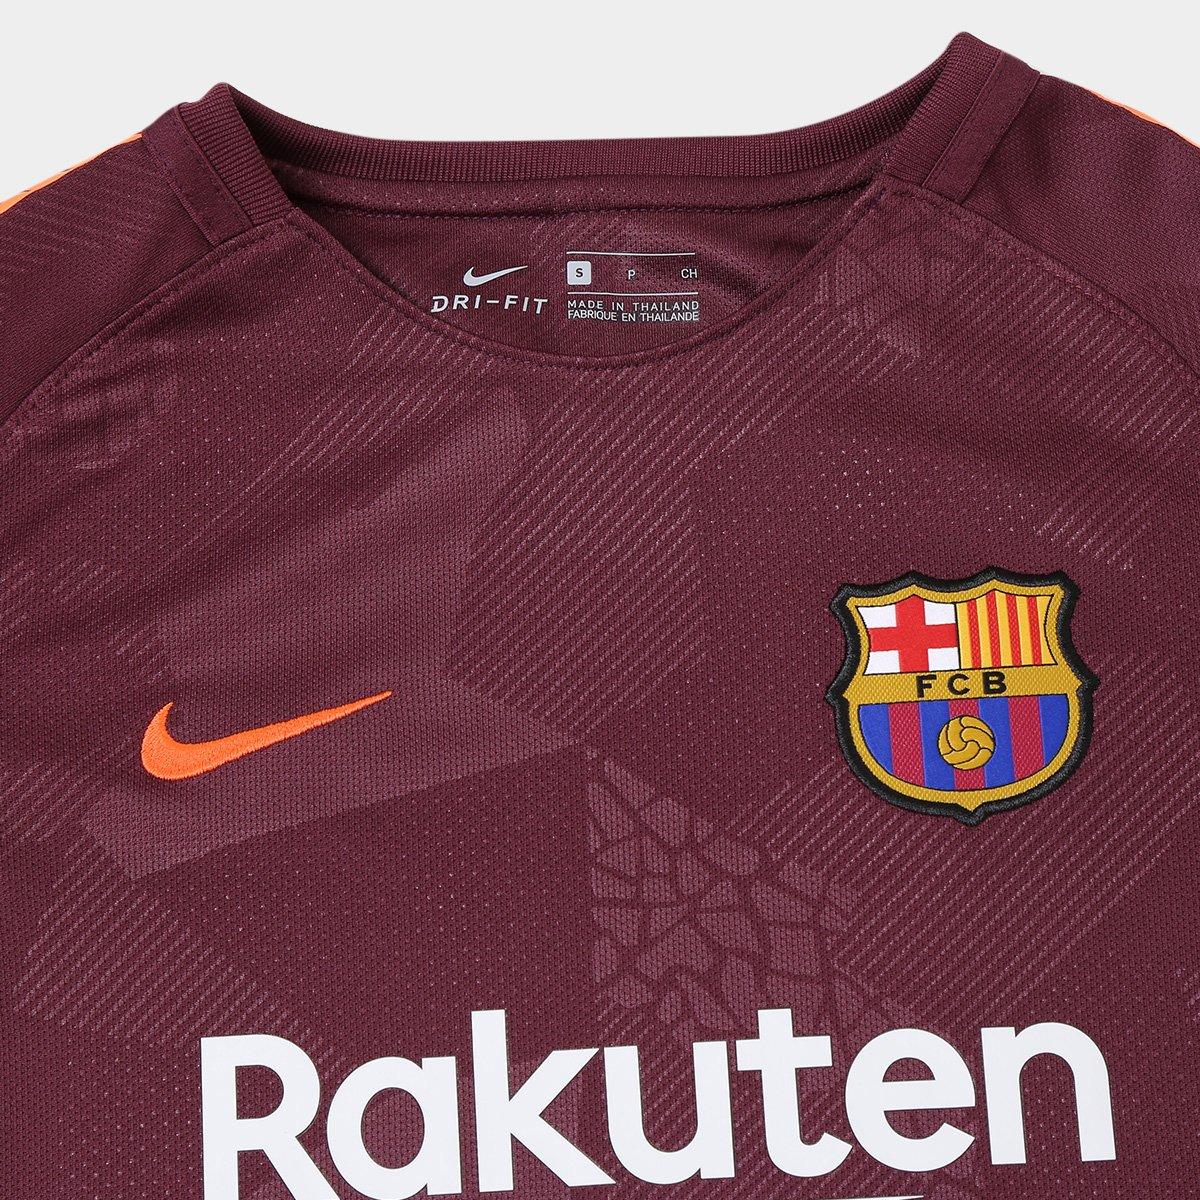 312e338dea Camisa Barcelona Juvenil Third 17 18 s n° - Torcedor Nike - Bordô ...